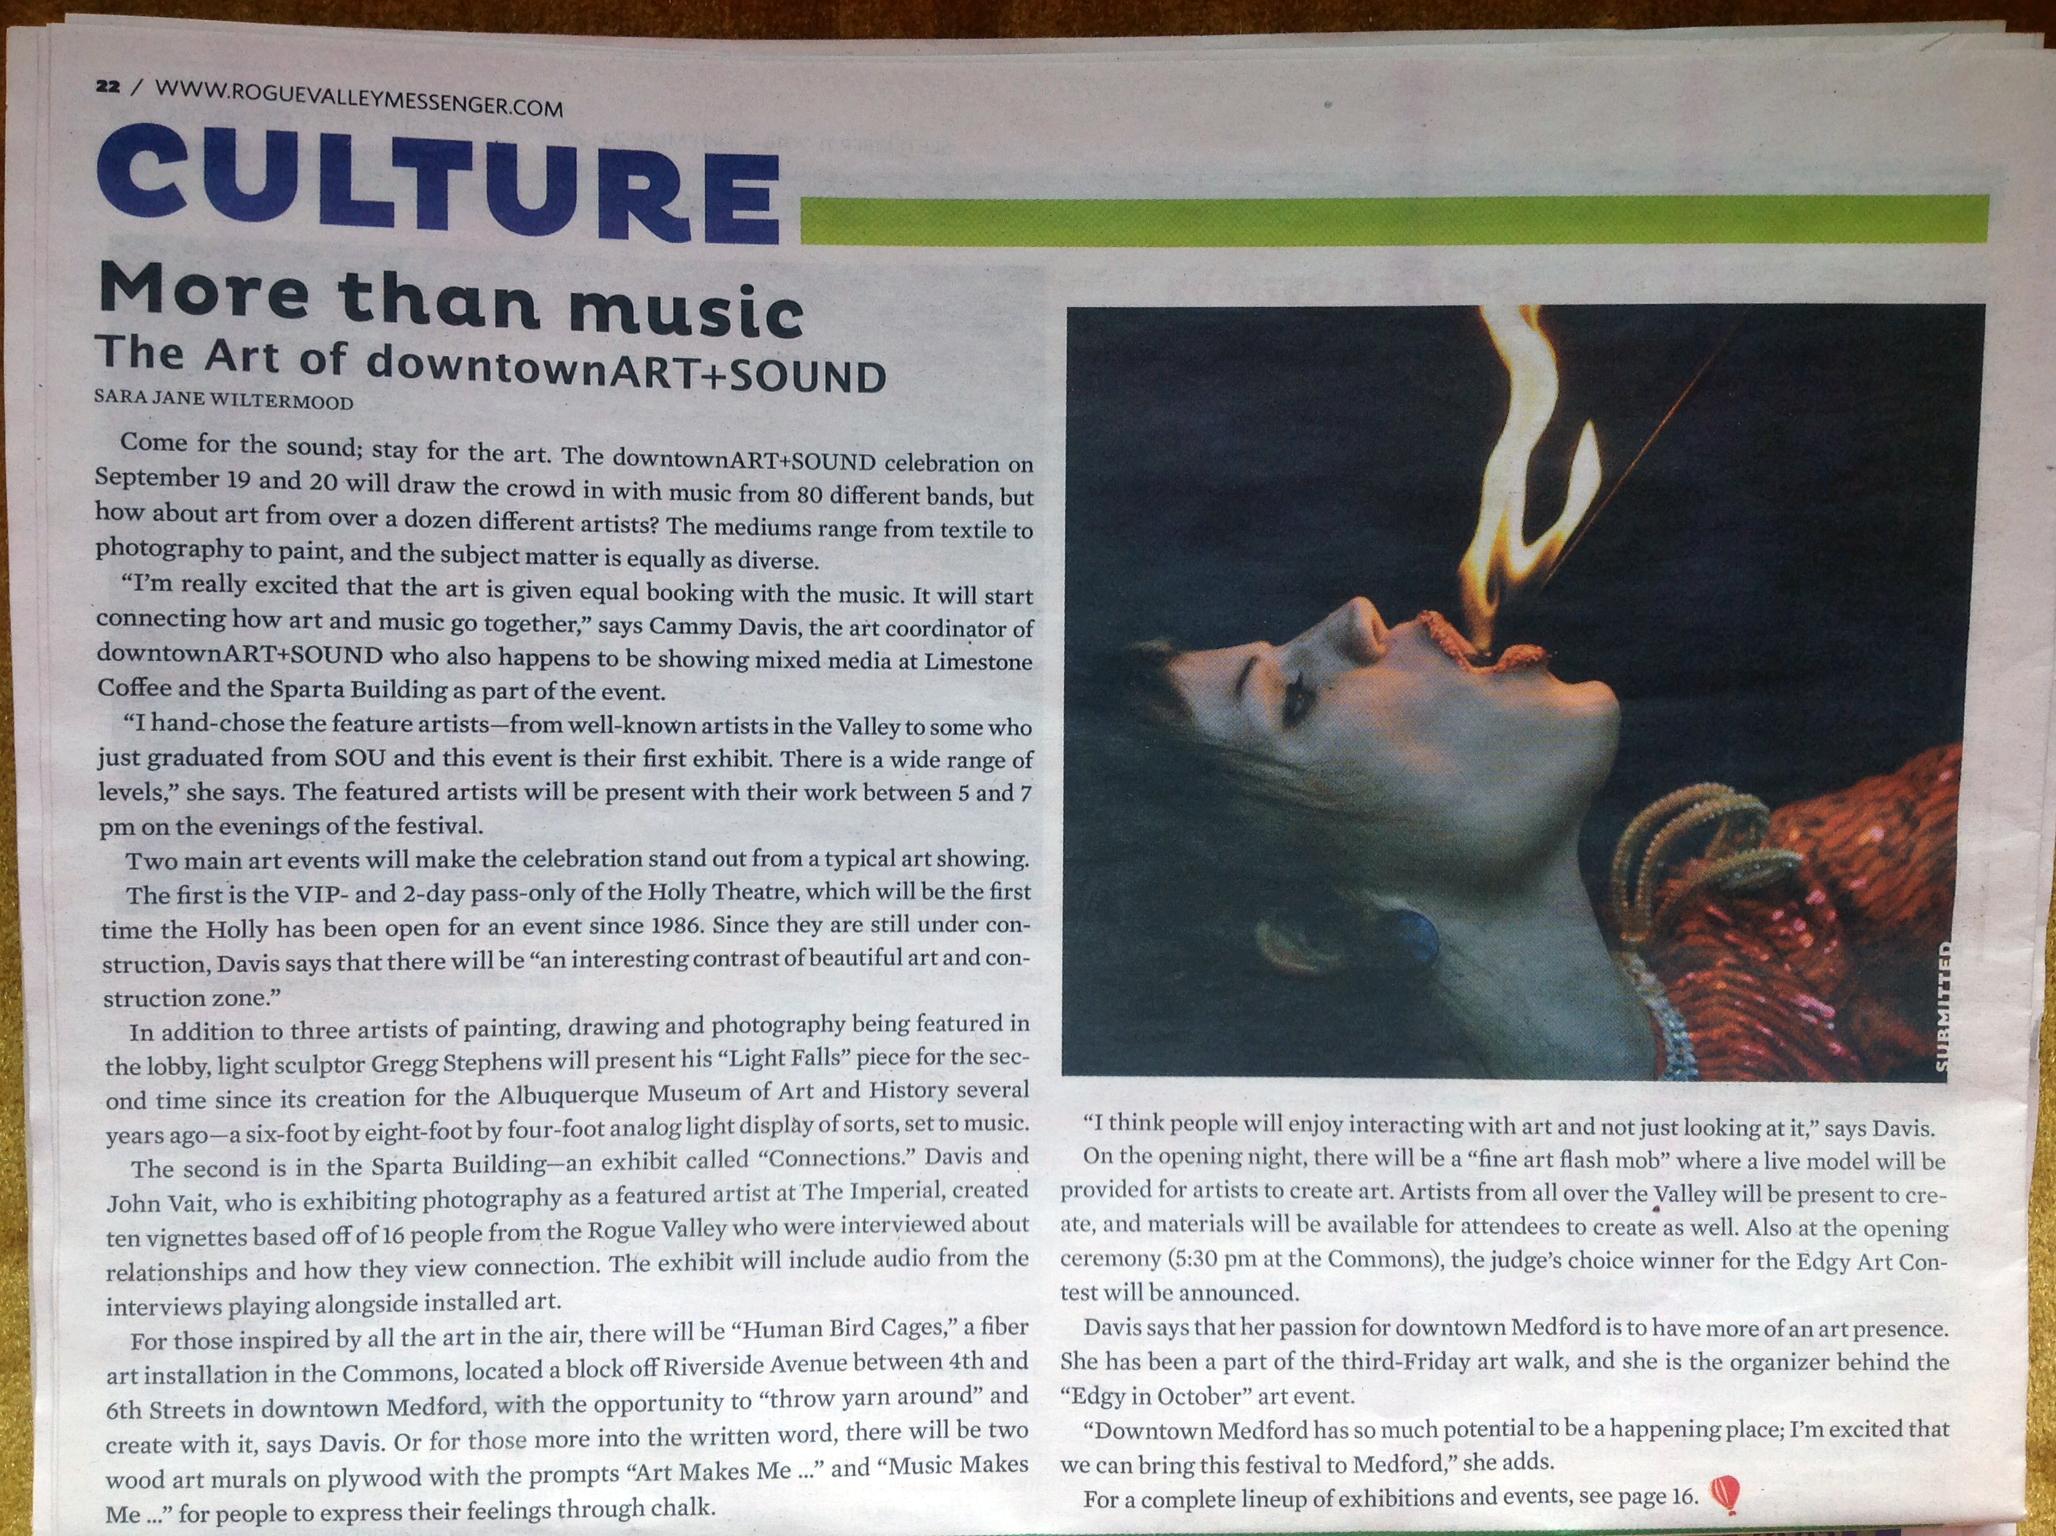 Rogue Valley Messenger article with Cammy Davis, Art Director, downtownART+SOUND